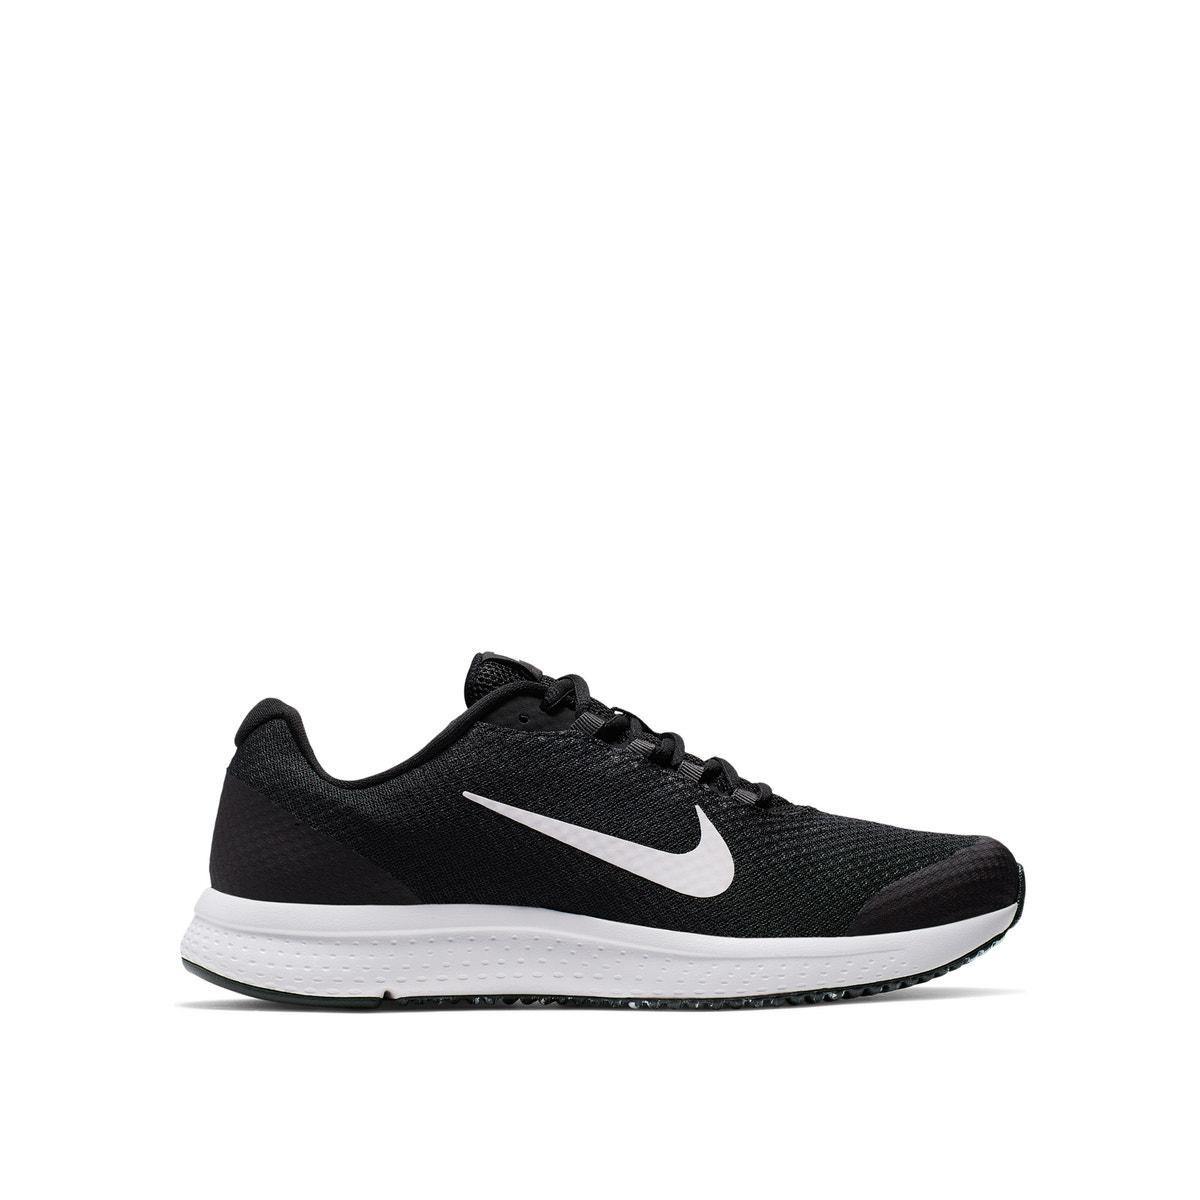 Zapatillas running Runallday Nike de hombre de color Negro